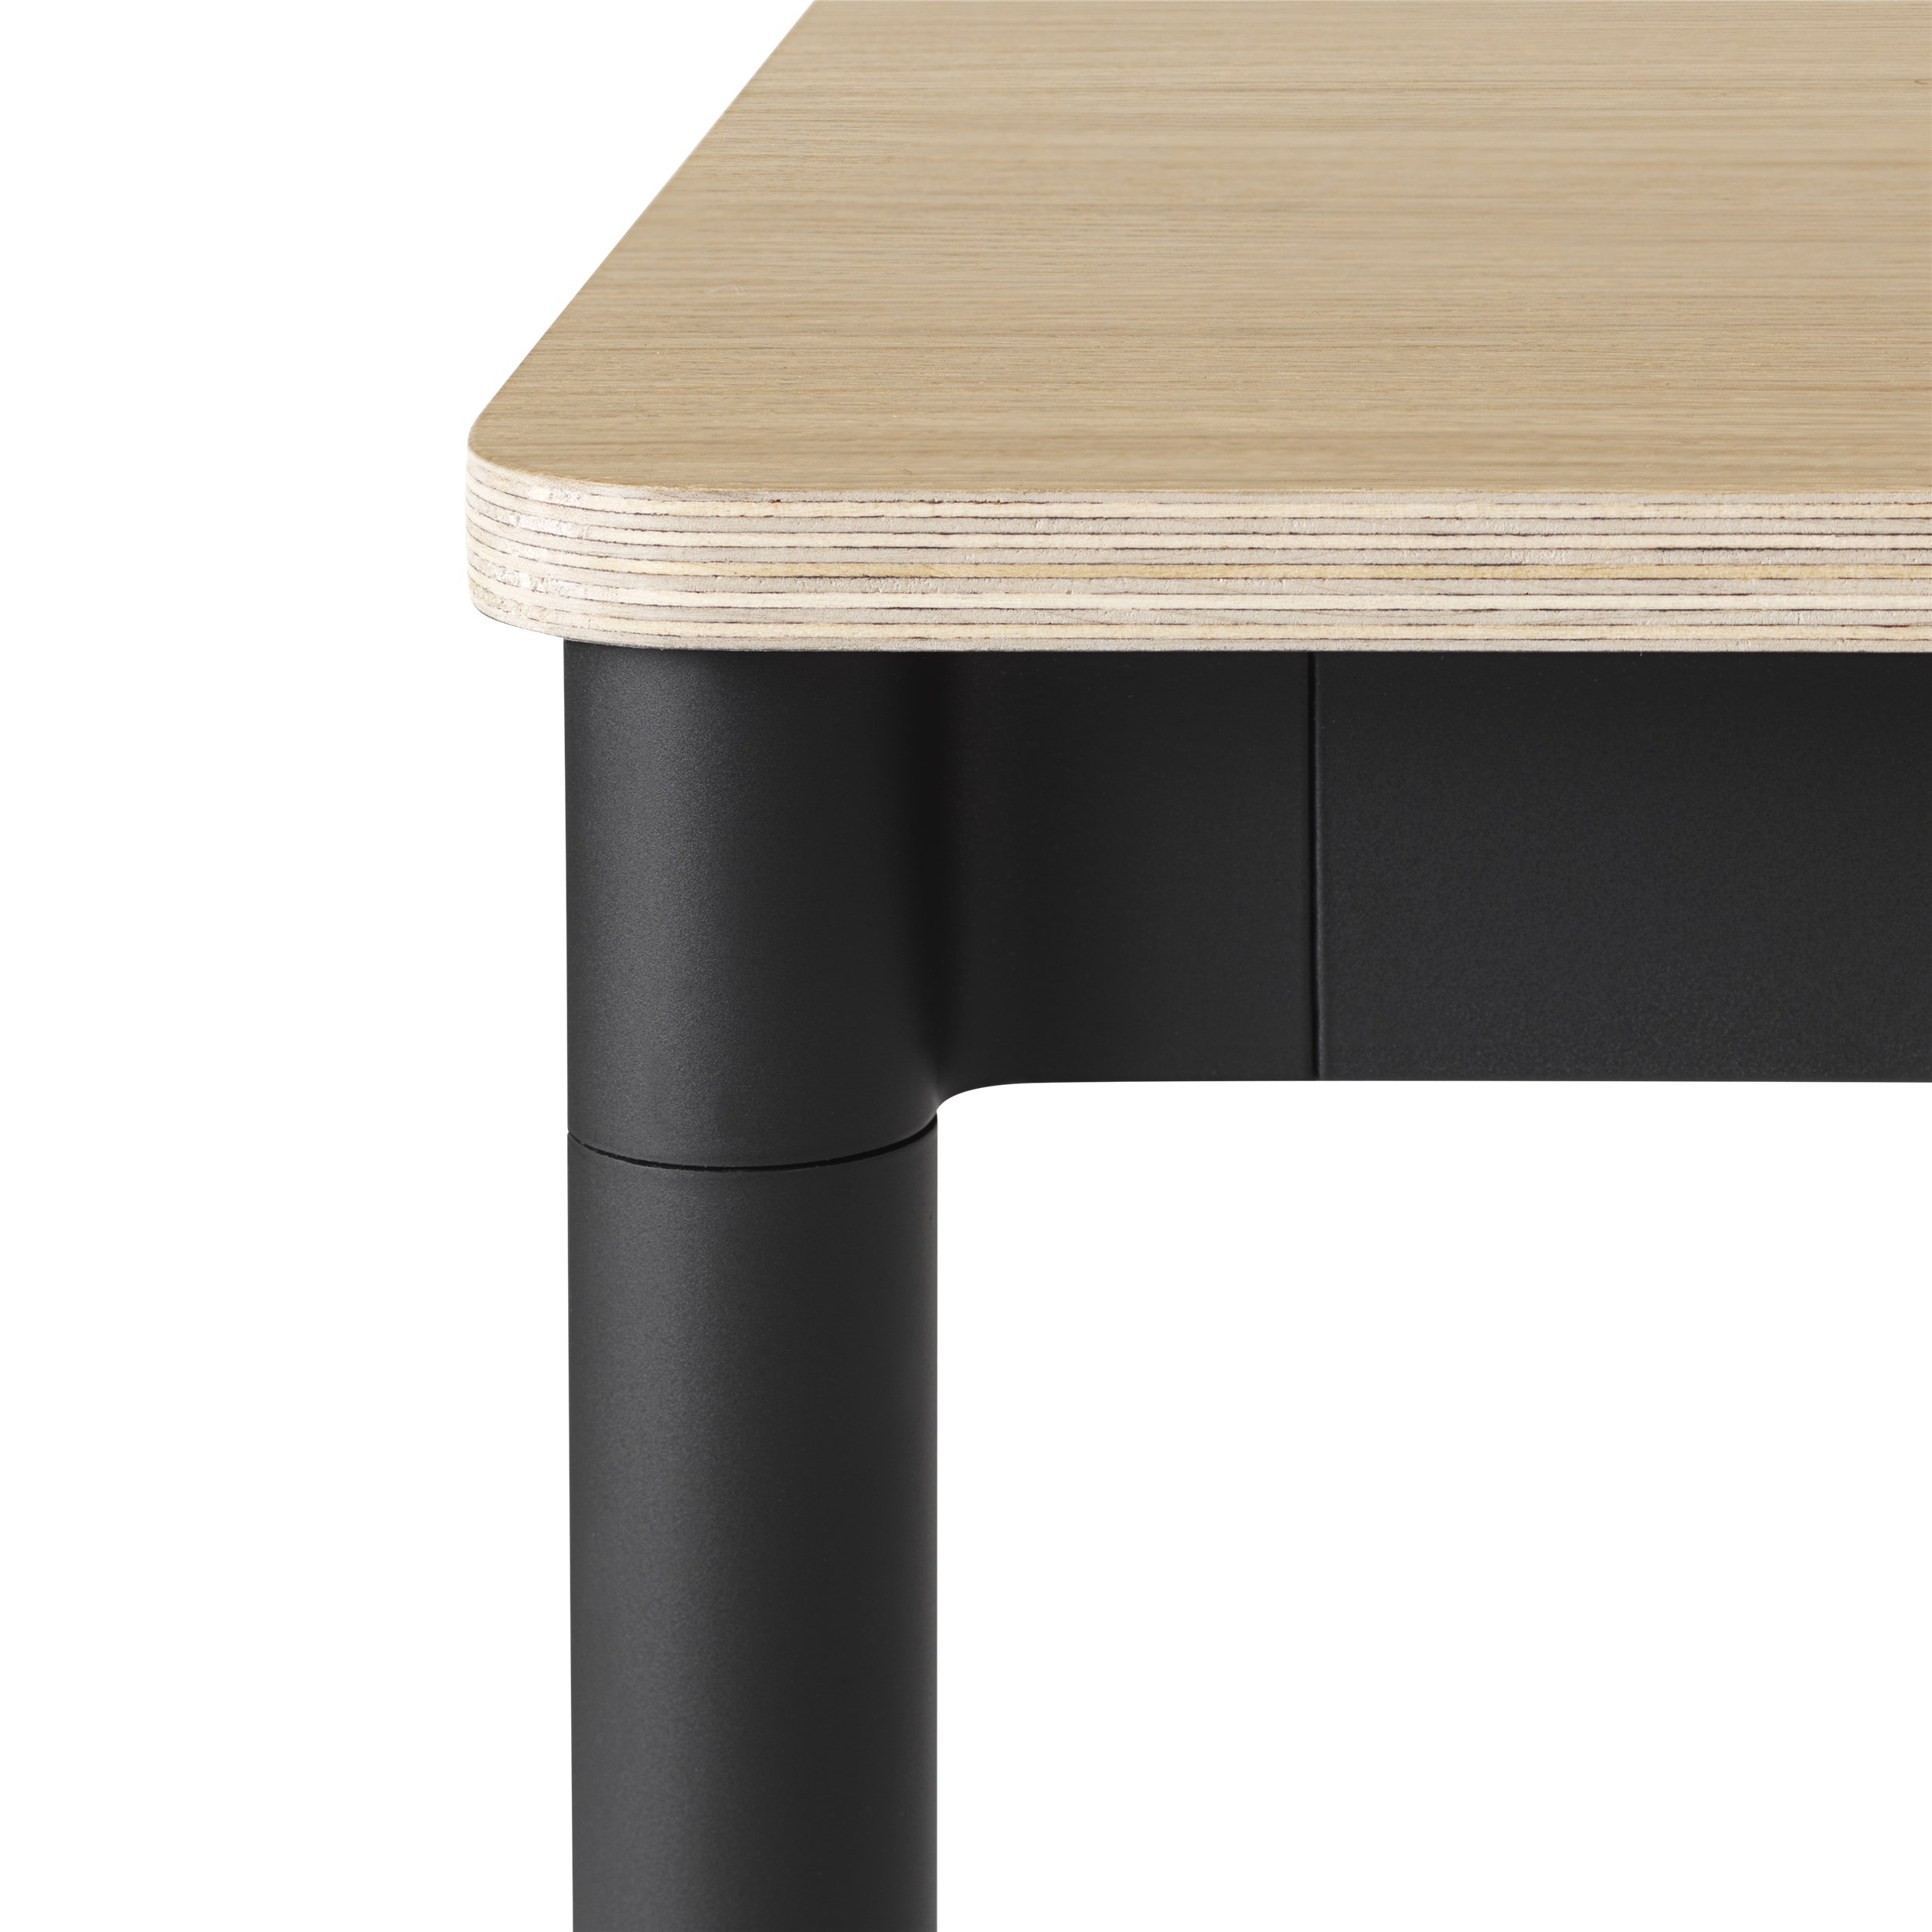 Muuto Base tafel 140x80 Oak Veneer/Plywood/Black